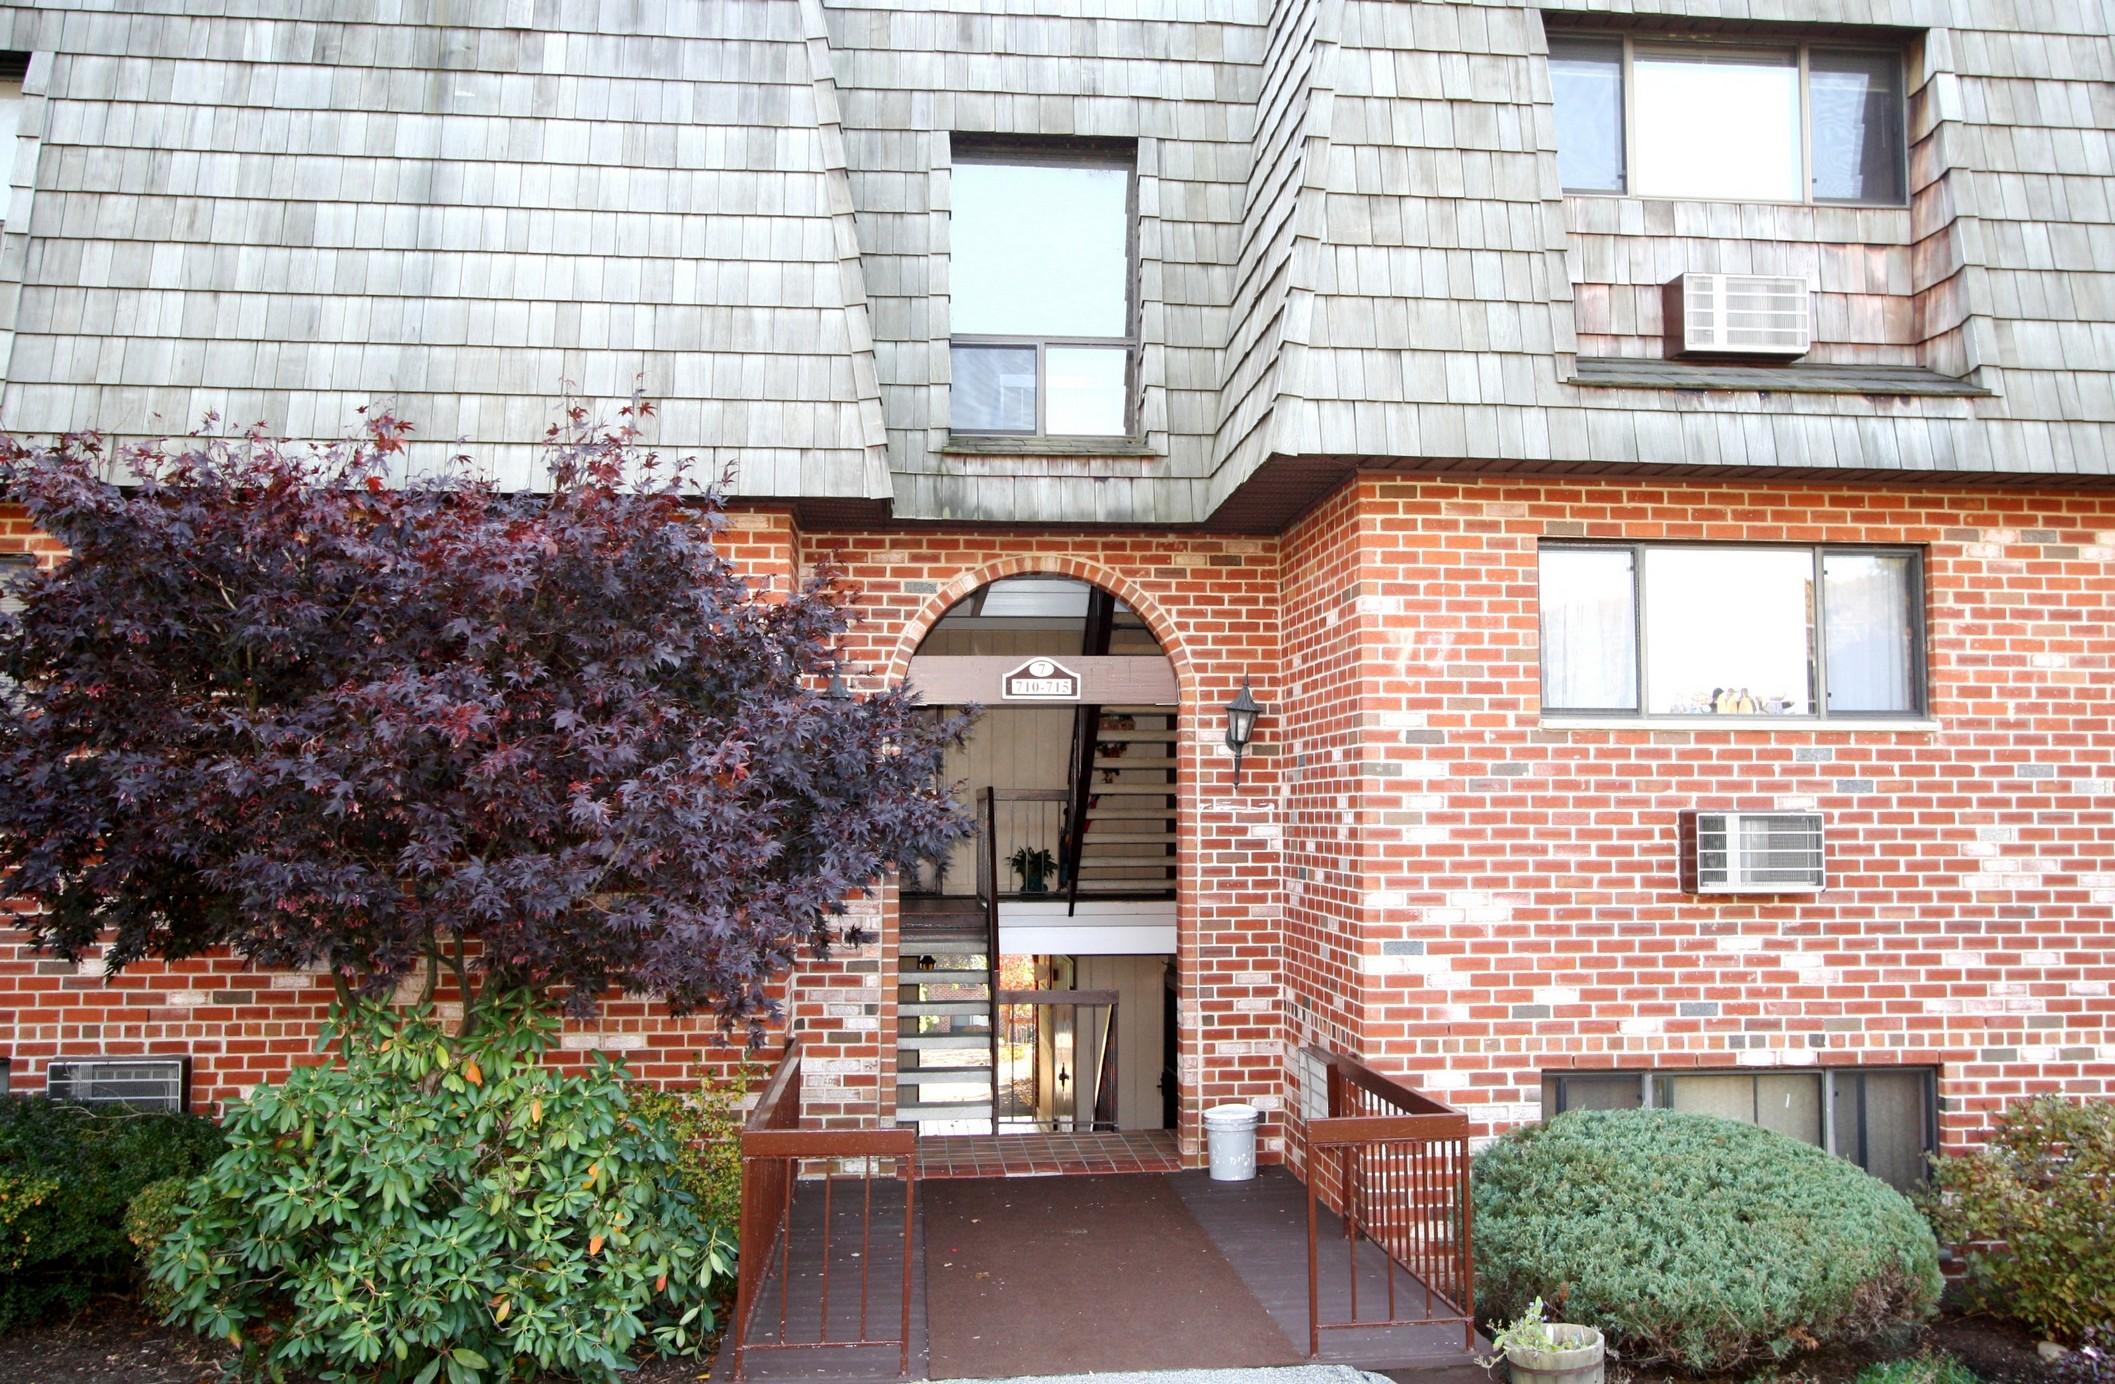 Condomínio para Venda às Easy Living at the Treetops 7-15 Briarcliff Drive Ossining, Nova York 10562 Estados Unidos